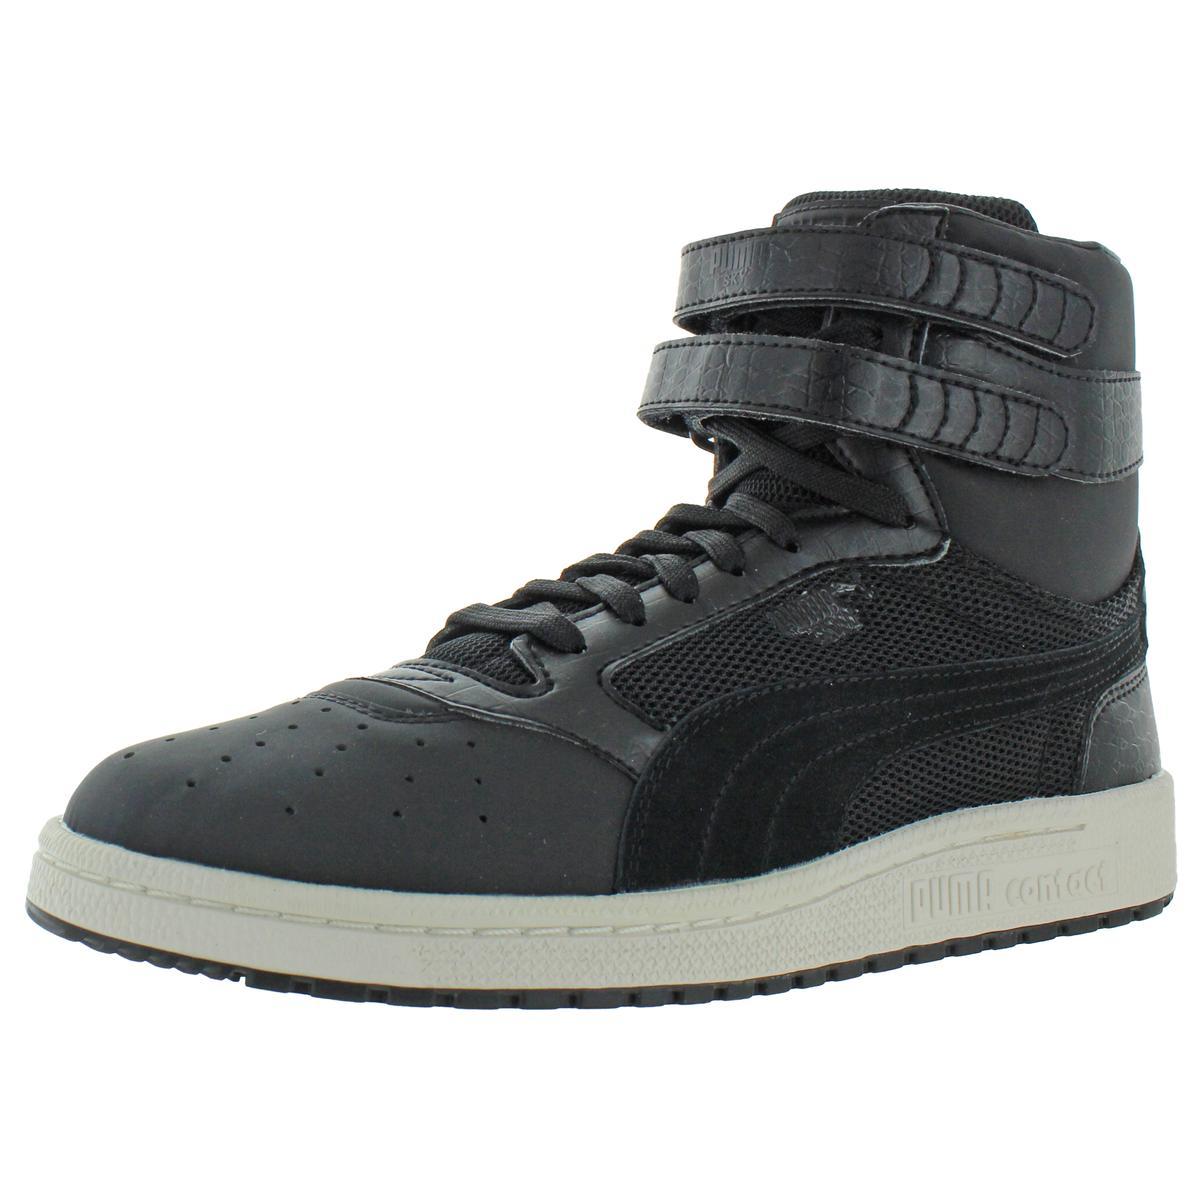 Puma Boys Sky II Hi Black Basketball Shoes Sneakers 6.5 ...